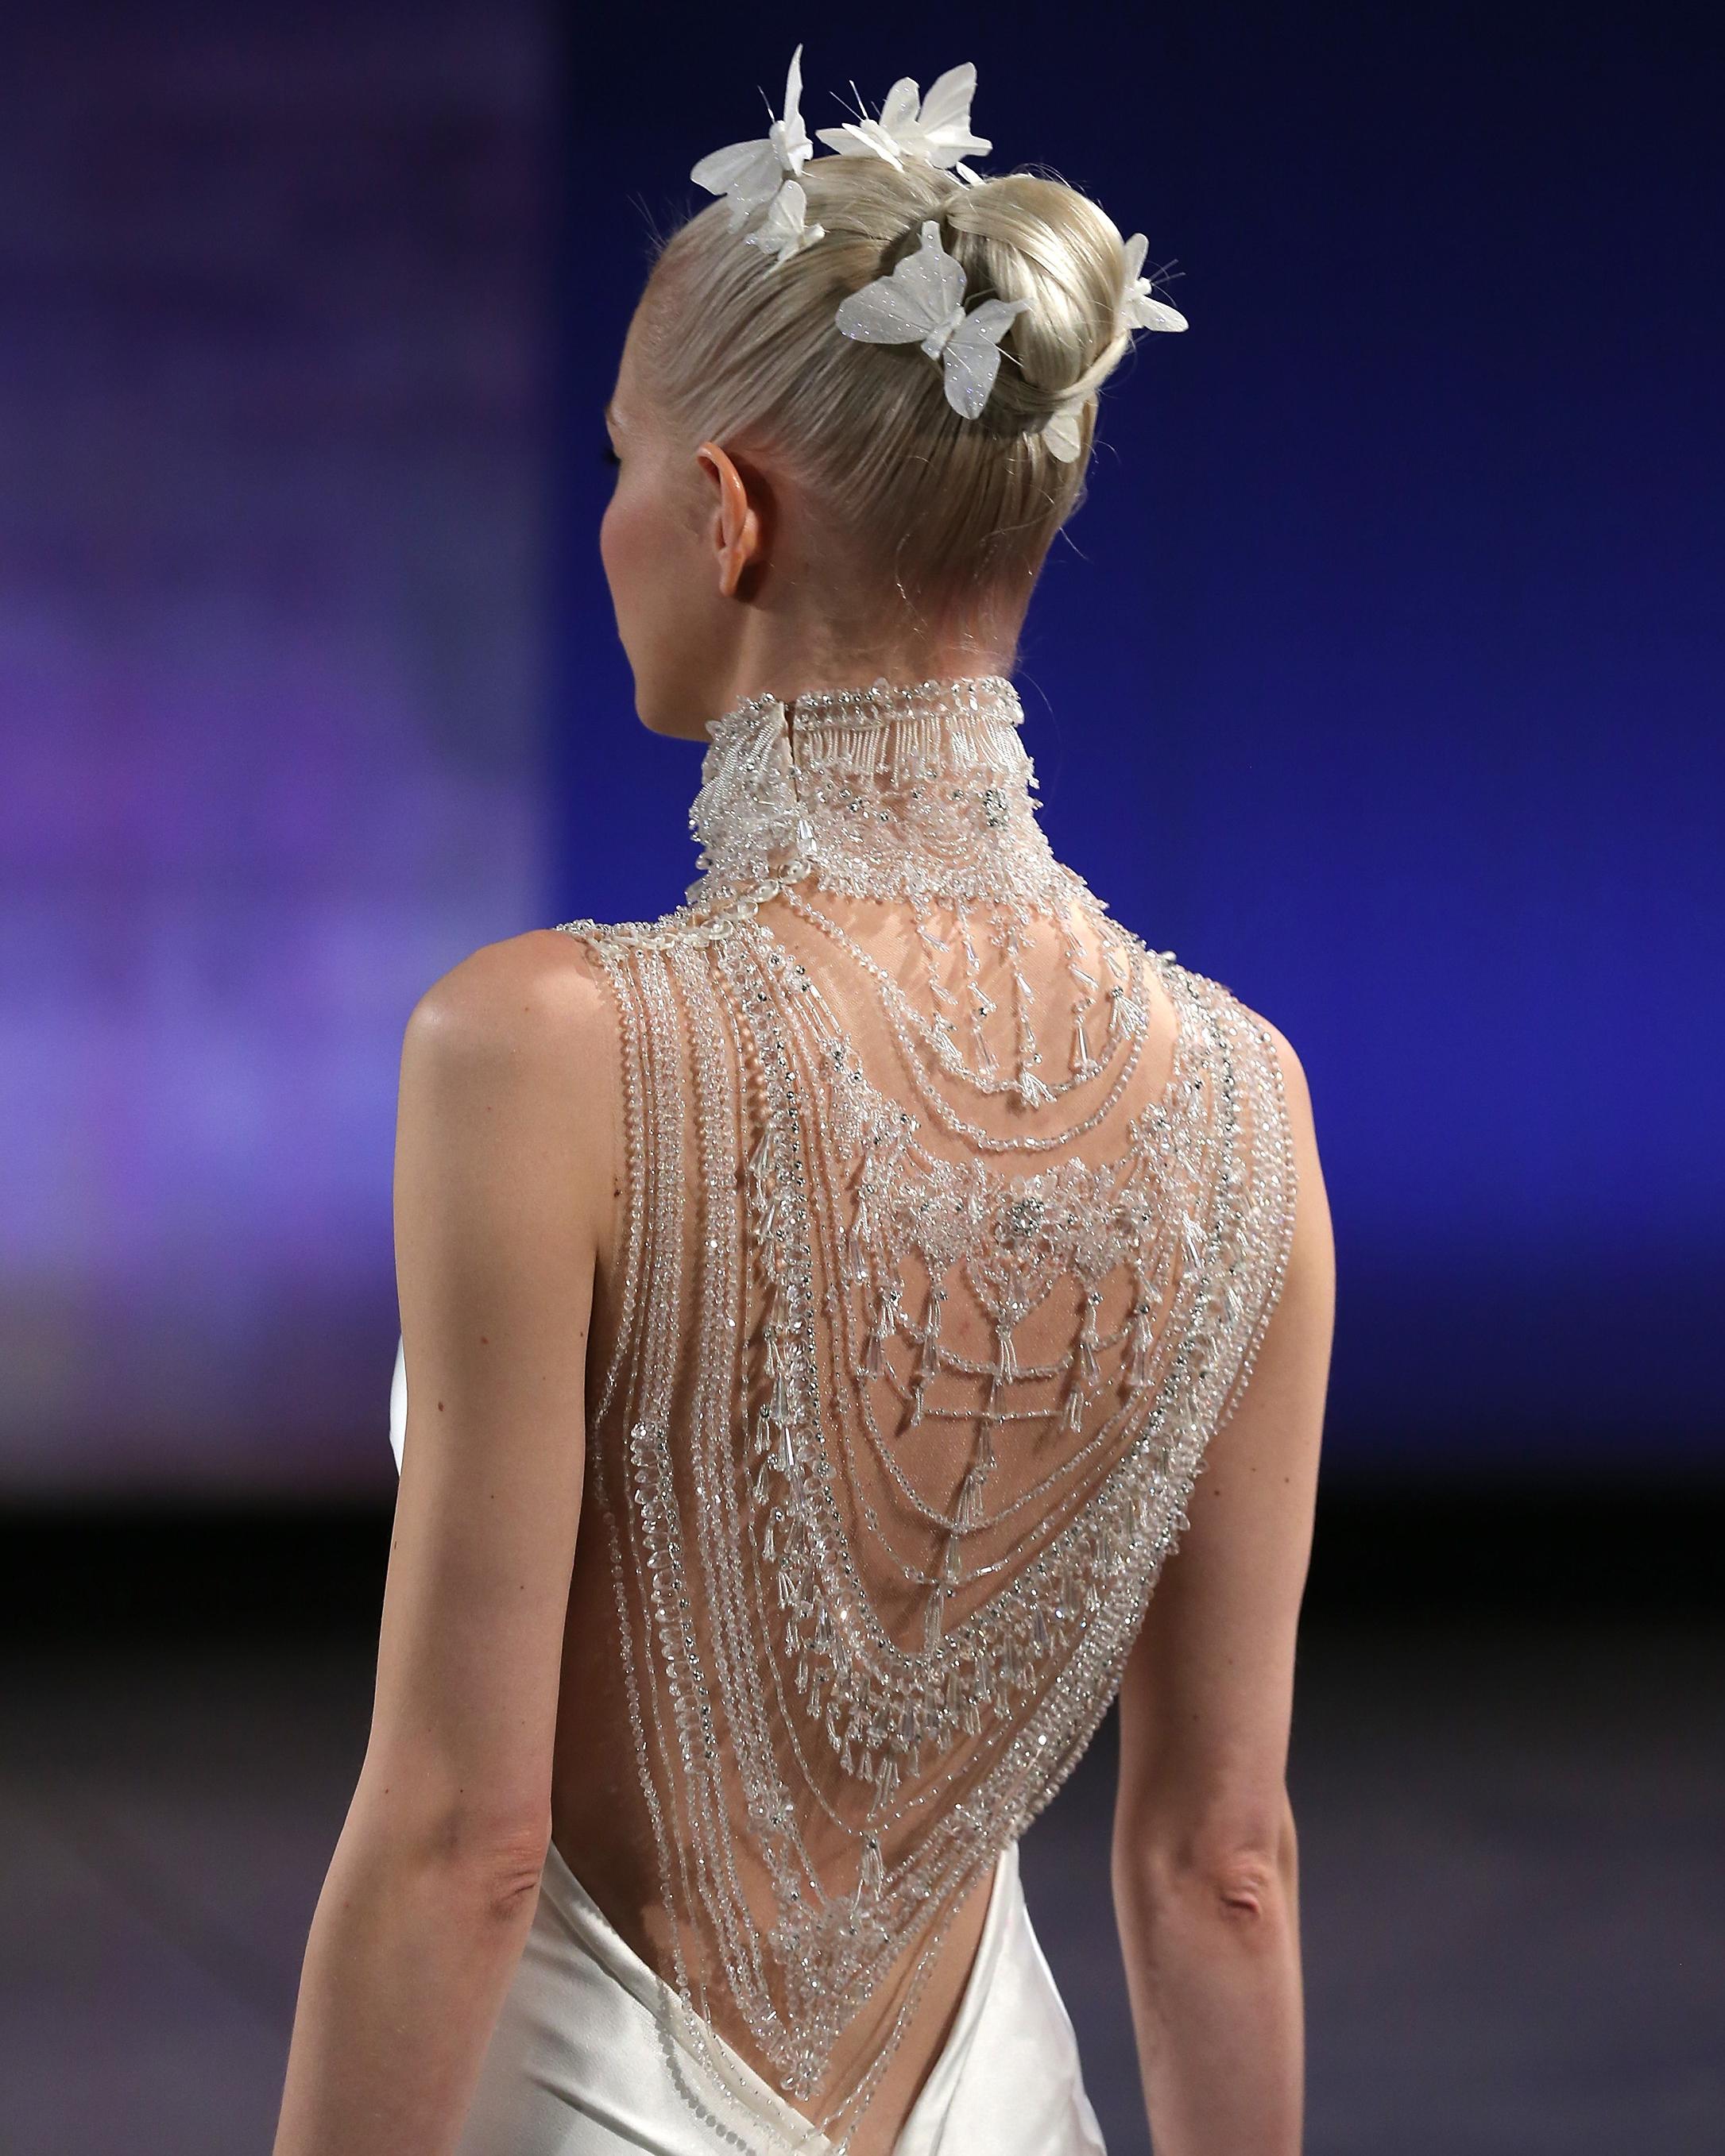 bridal-hair-adornments-spring2016-ines-di-santo-0415.jpg